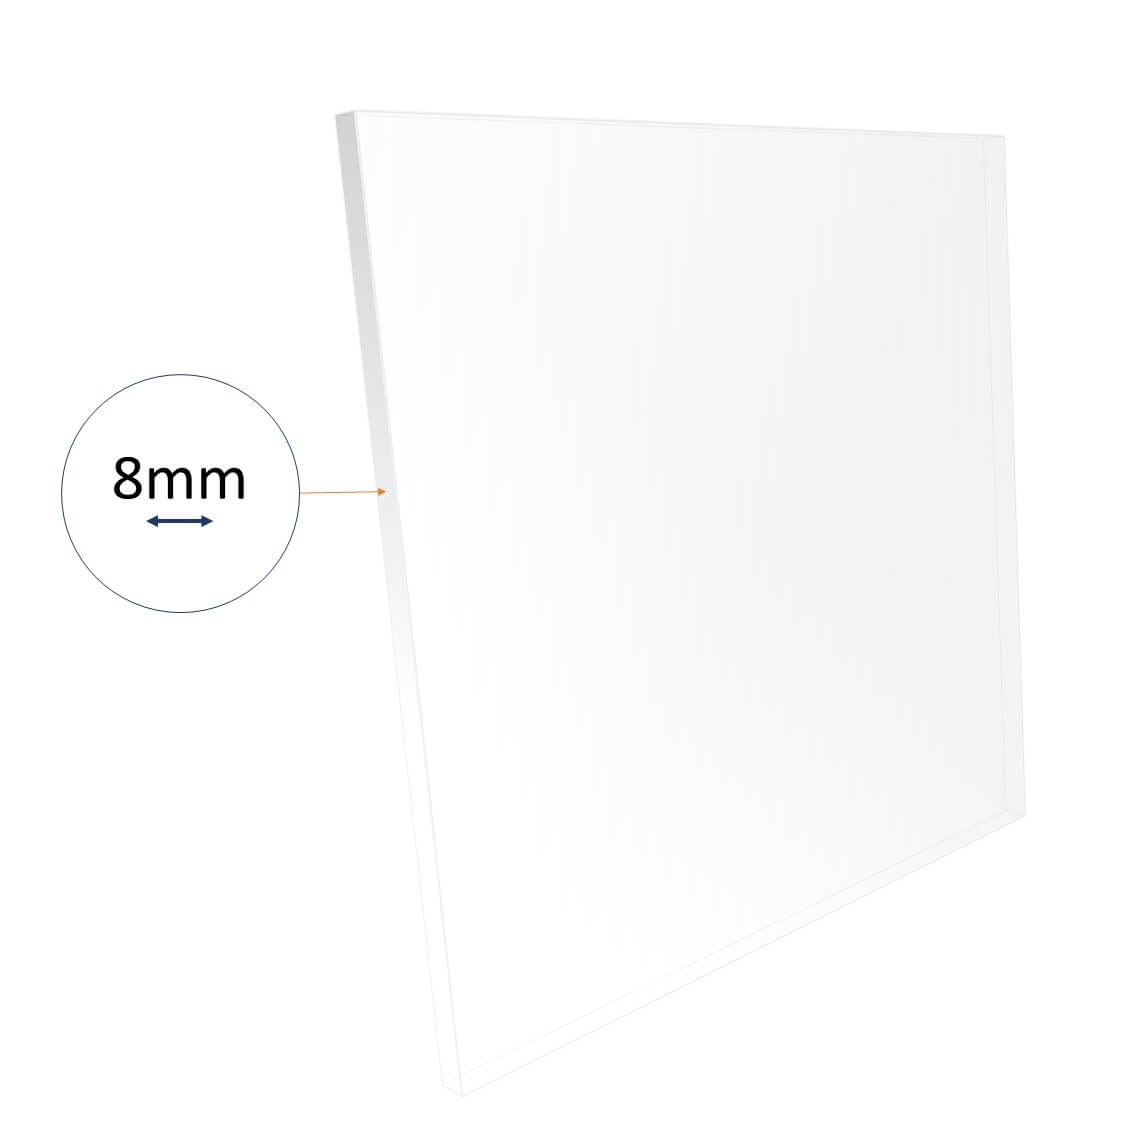 8mm acrylic sheet cut to size